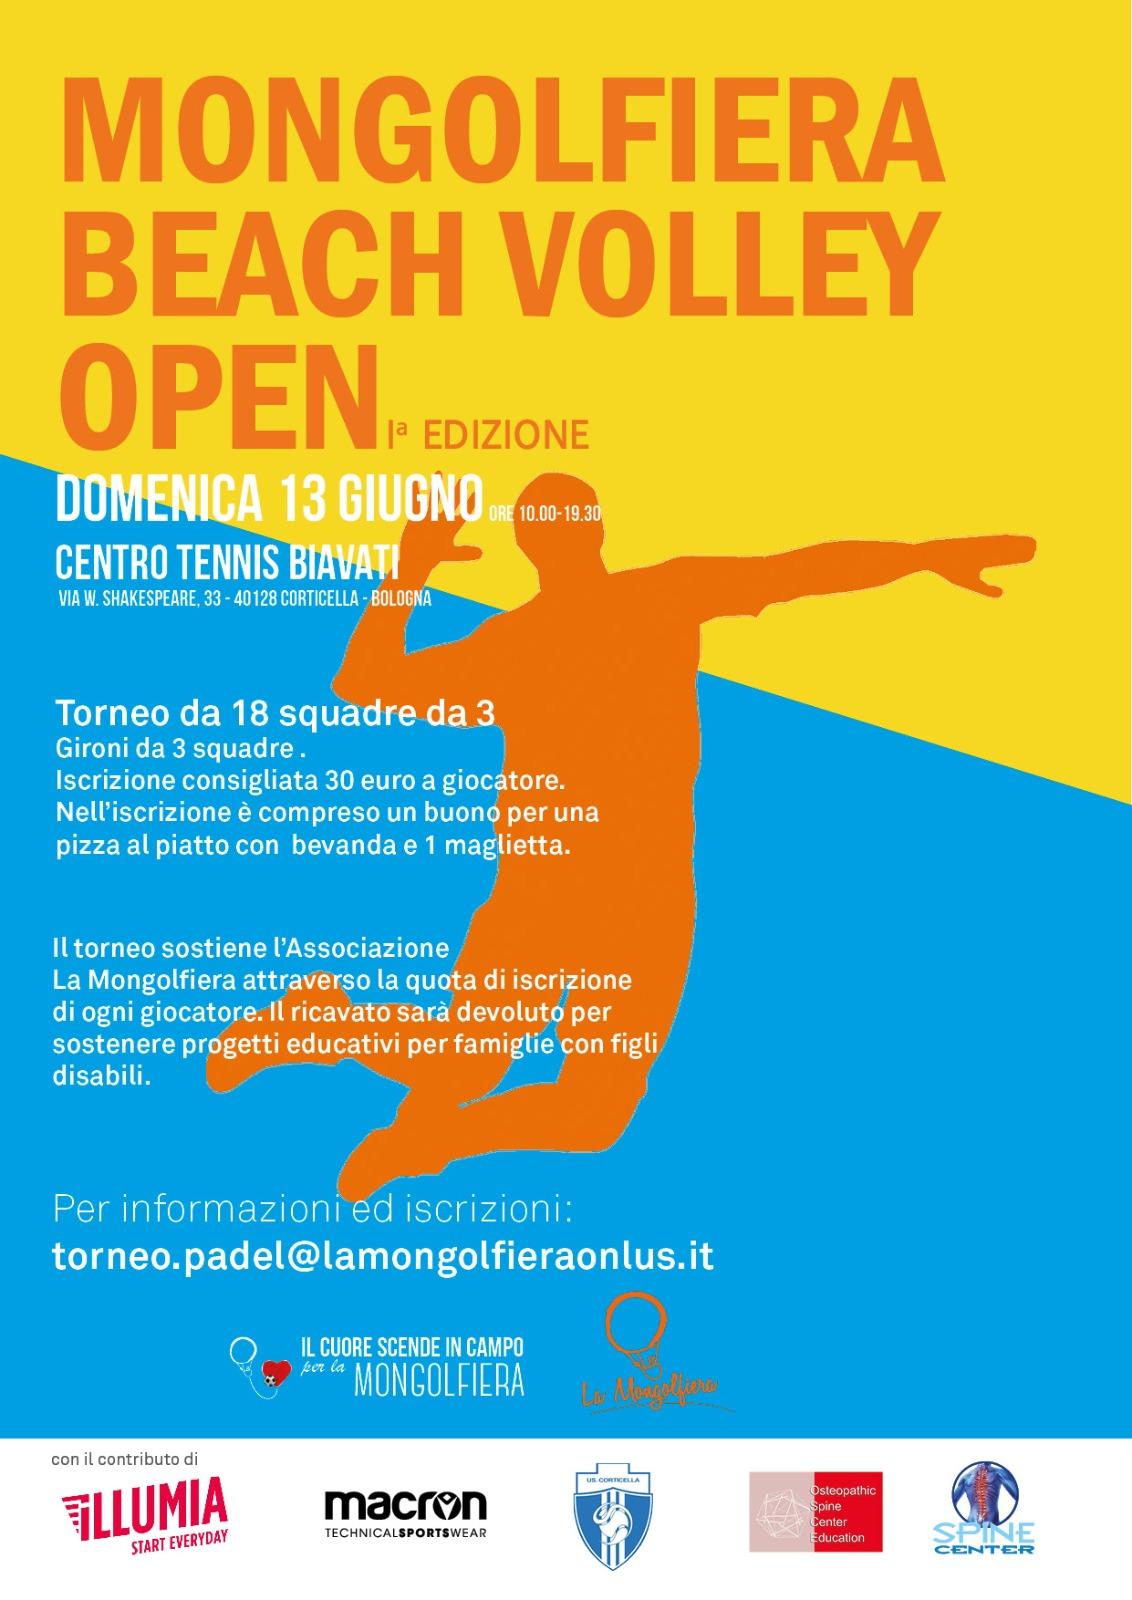 La mongolfiera onlus torneo beach volley open 2021